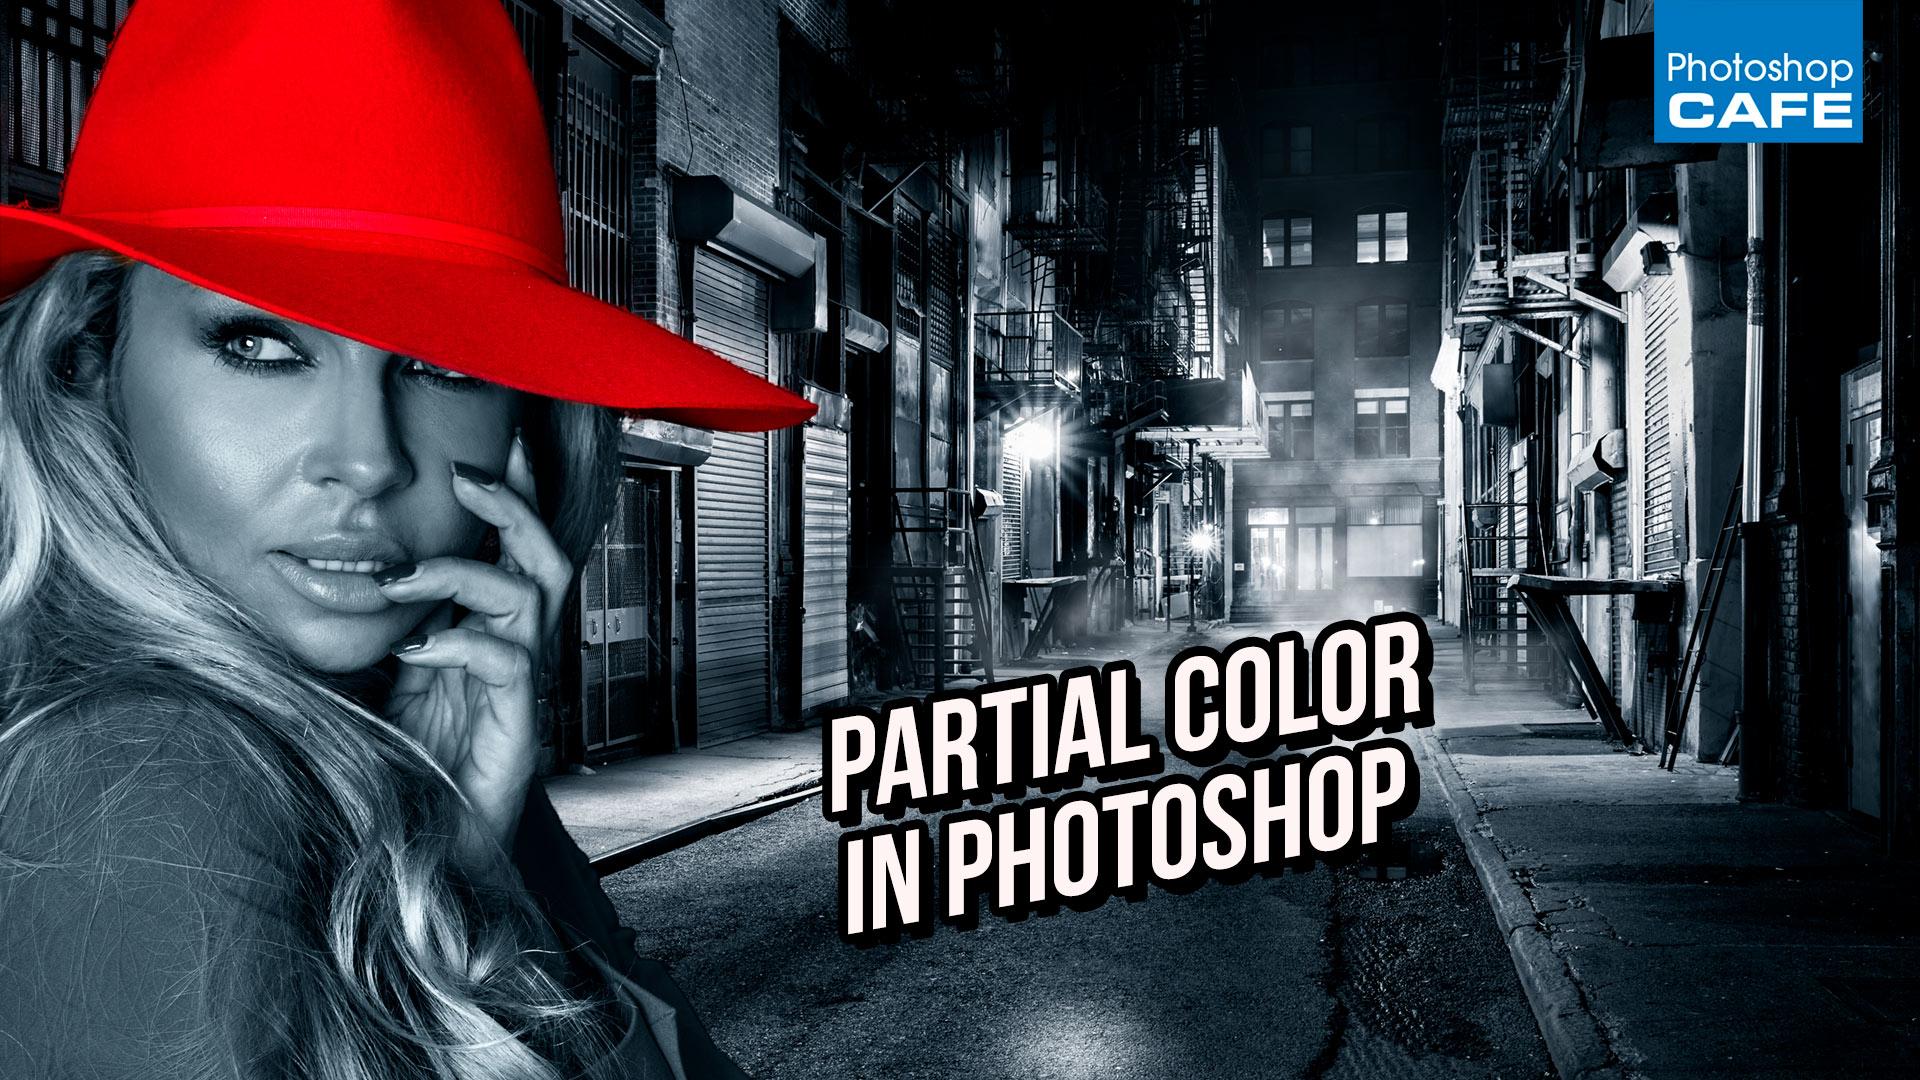 color splash, partial color effect in Photoshop tutorial